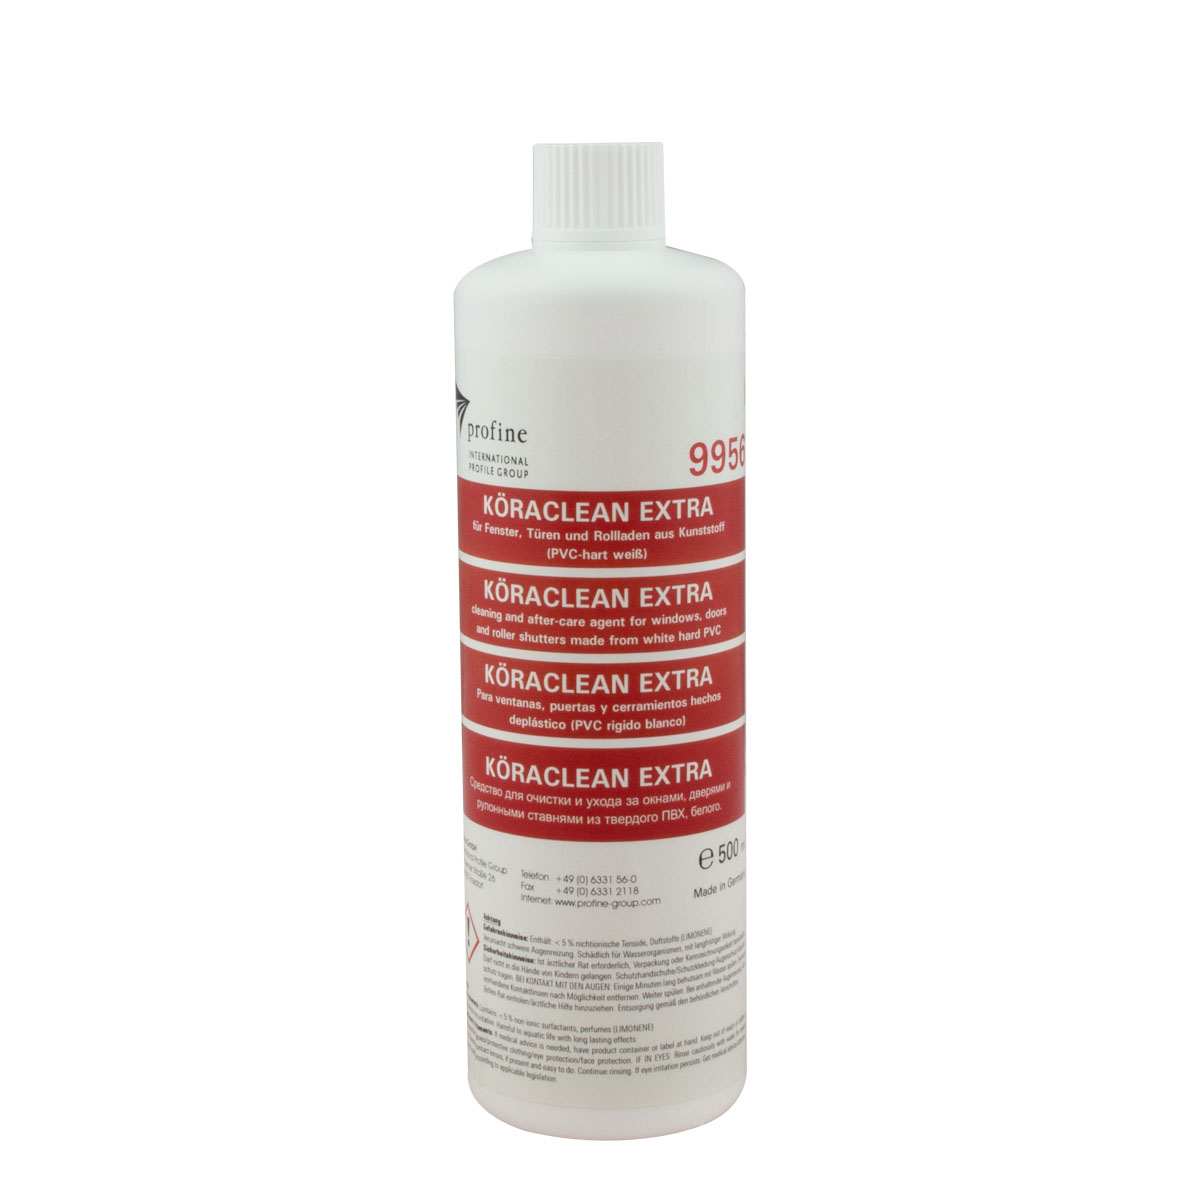 Köraclean Extra, Kunststoffreiniger 500ml 9965